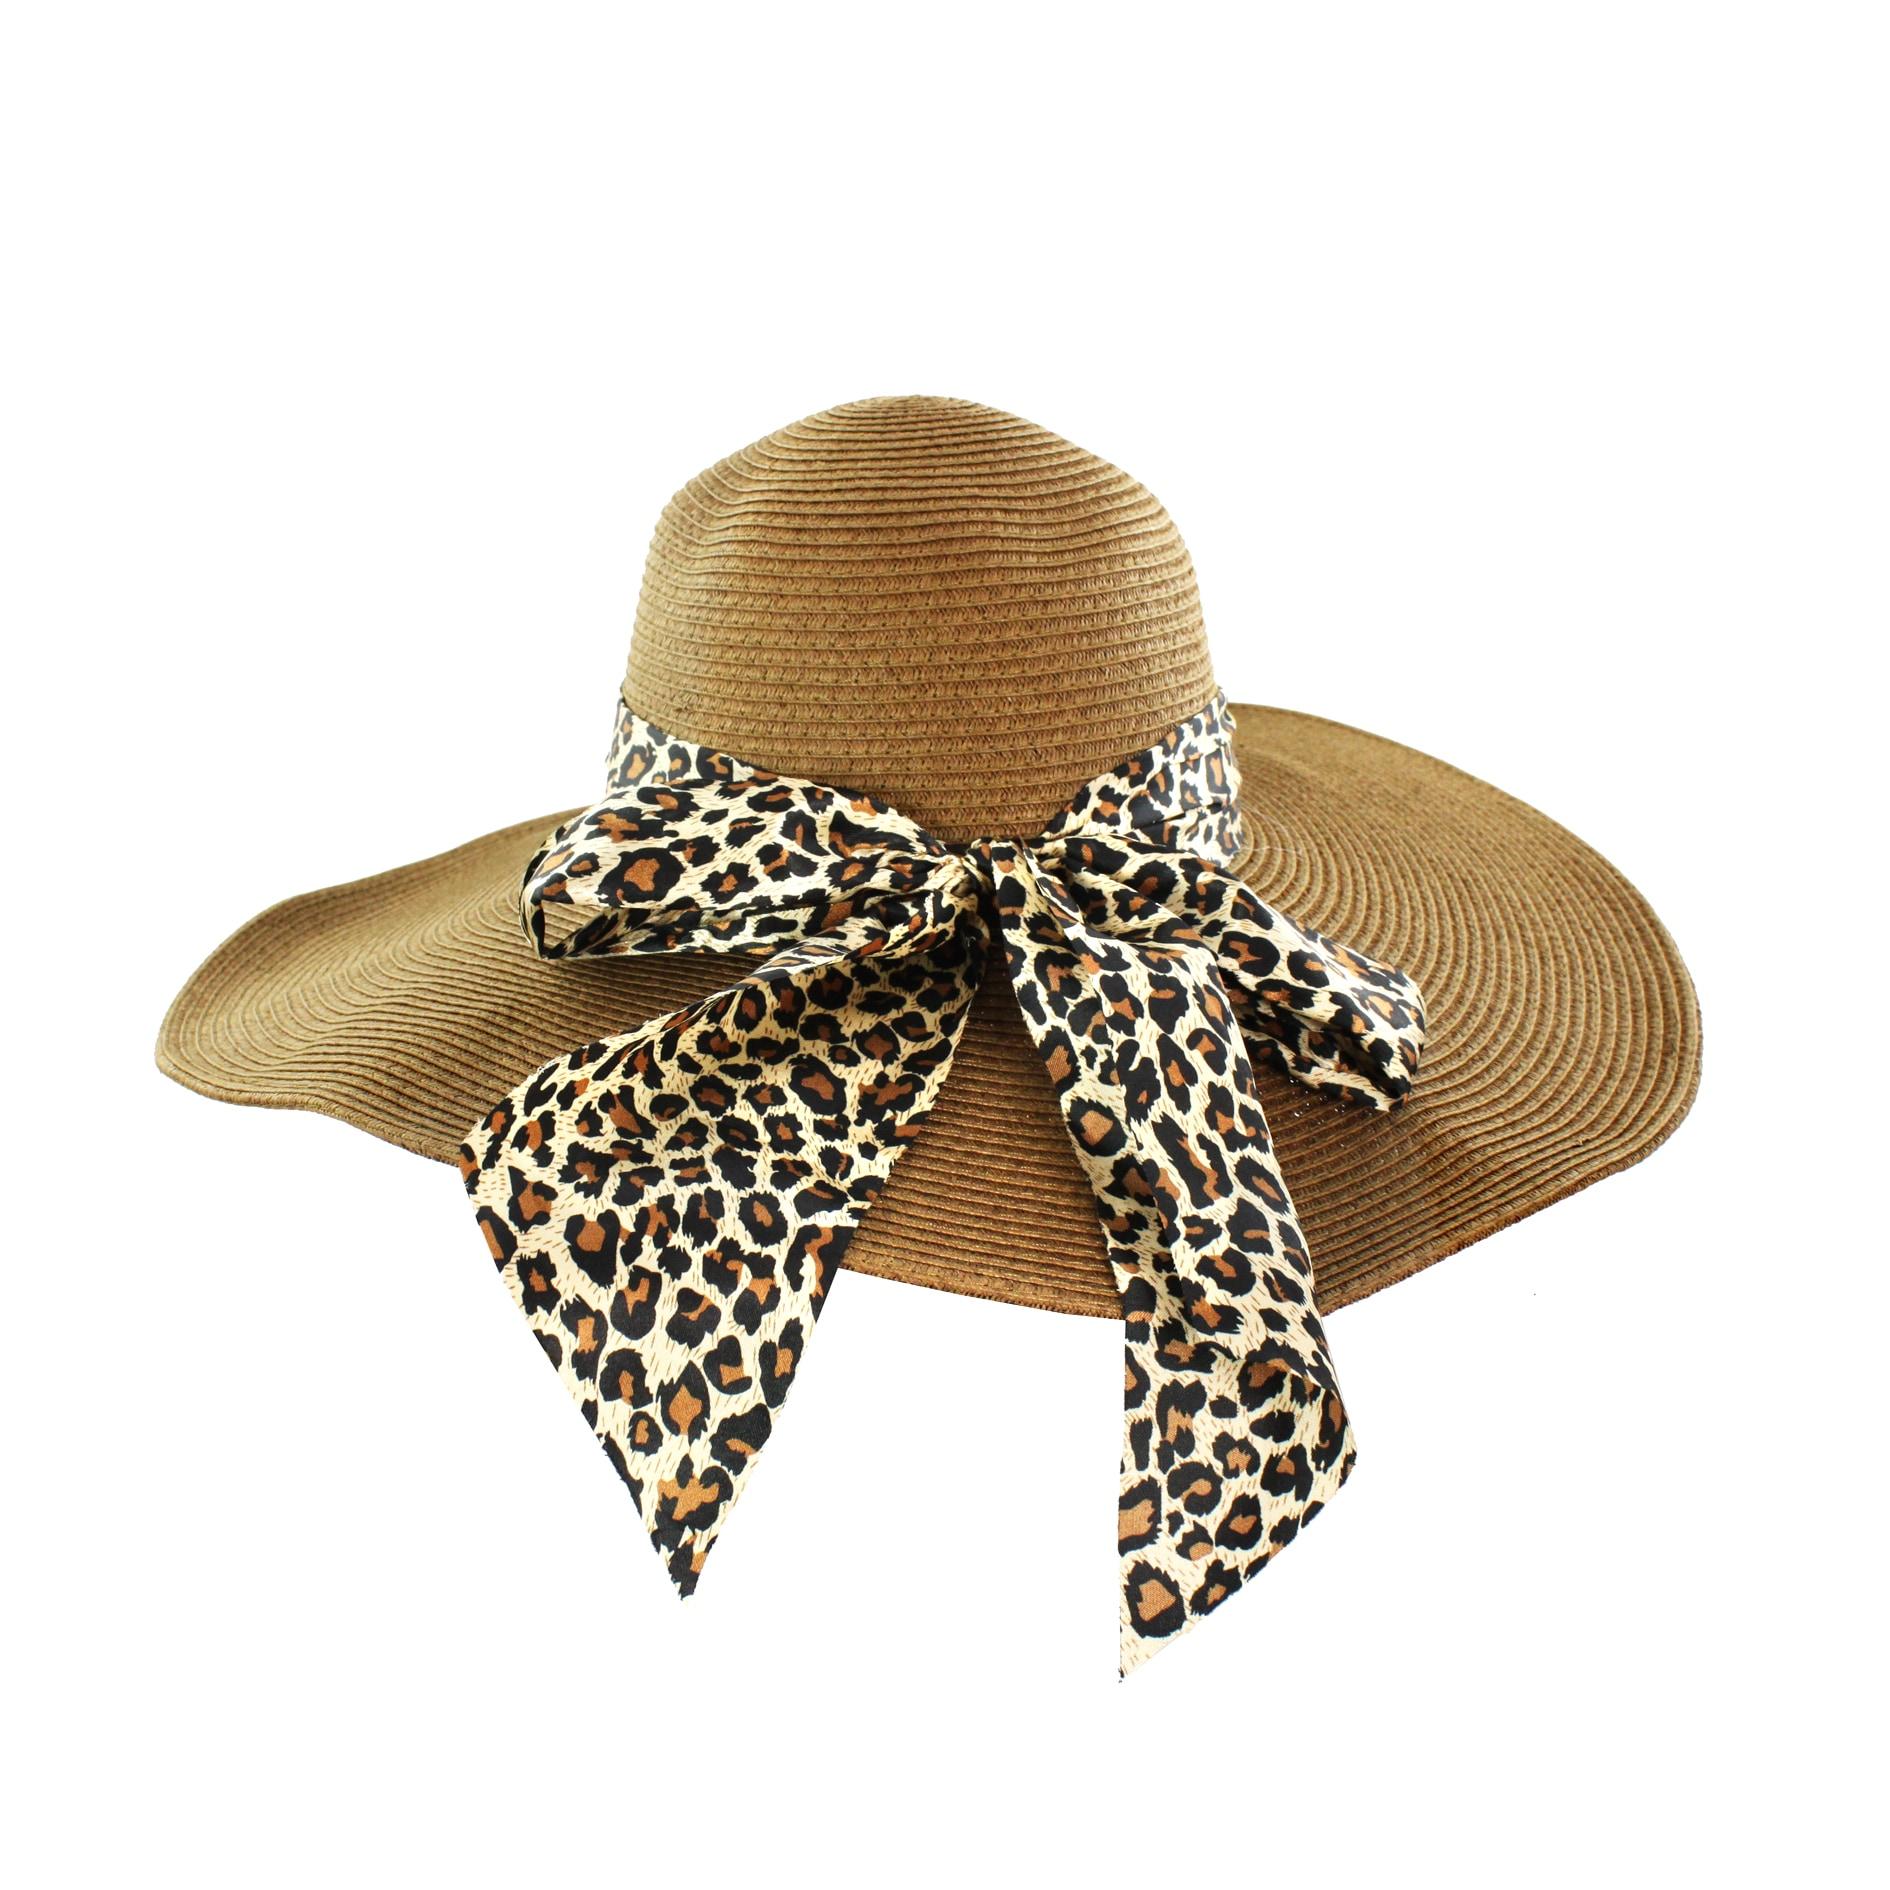 Faddism Women's Brown Ribbon Straw Sun Hat